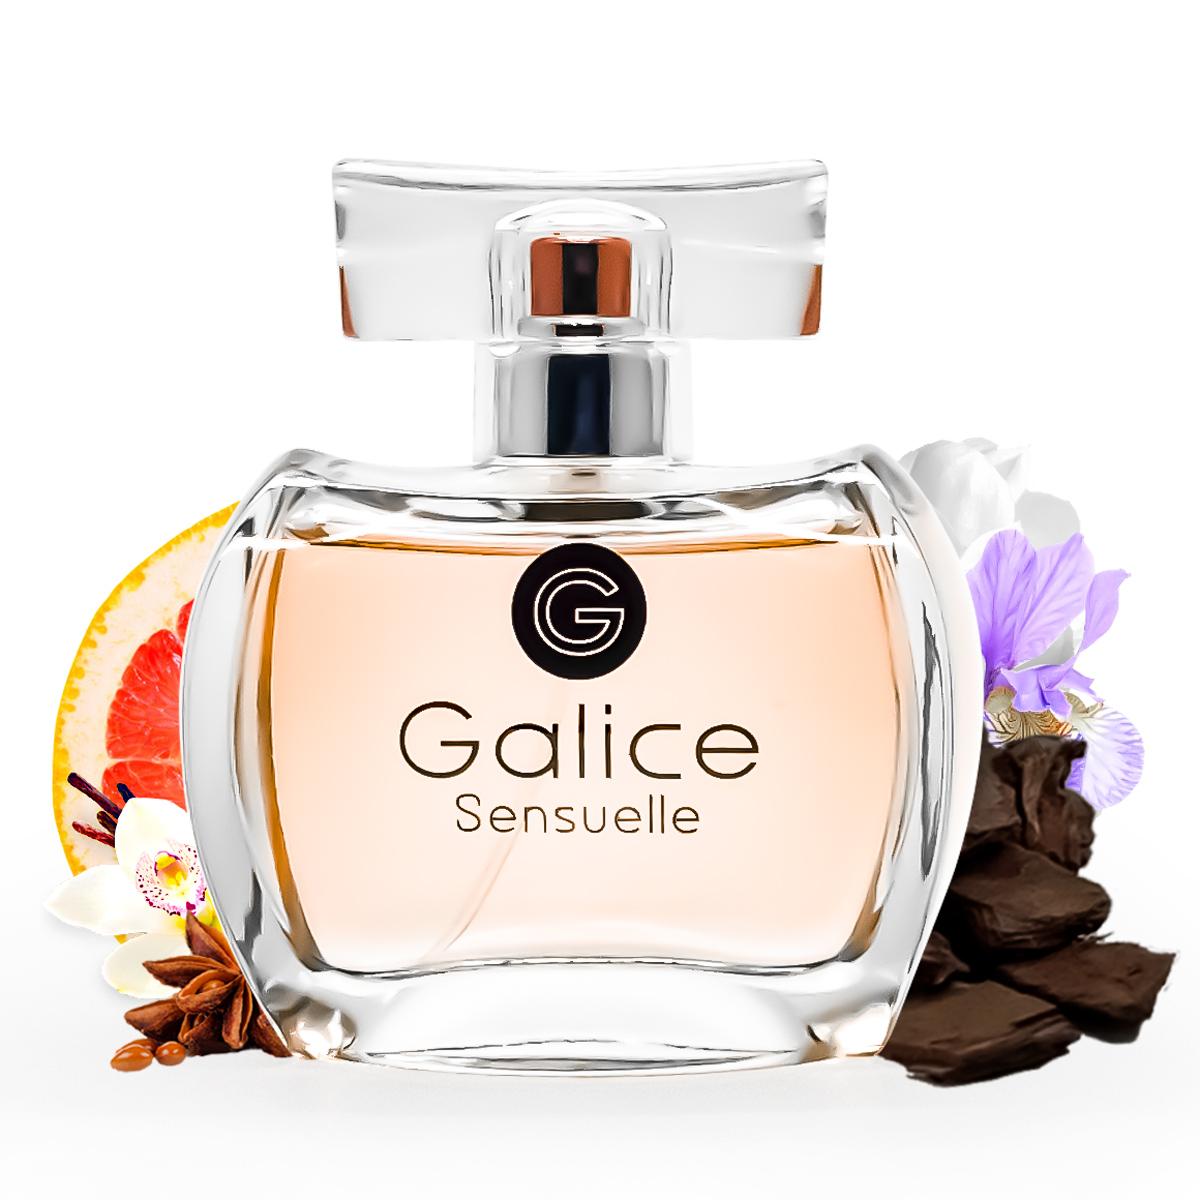 Kit Perfume Galice Sensuelle 100ml e desodorante Paris Bleu